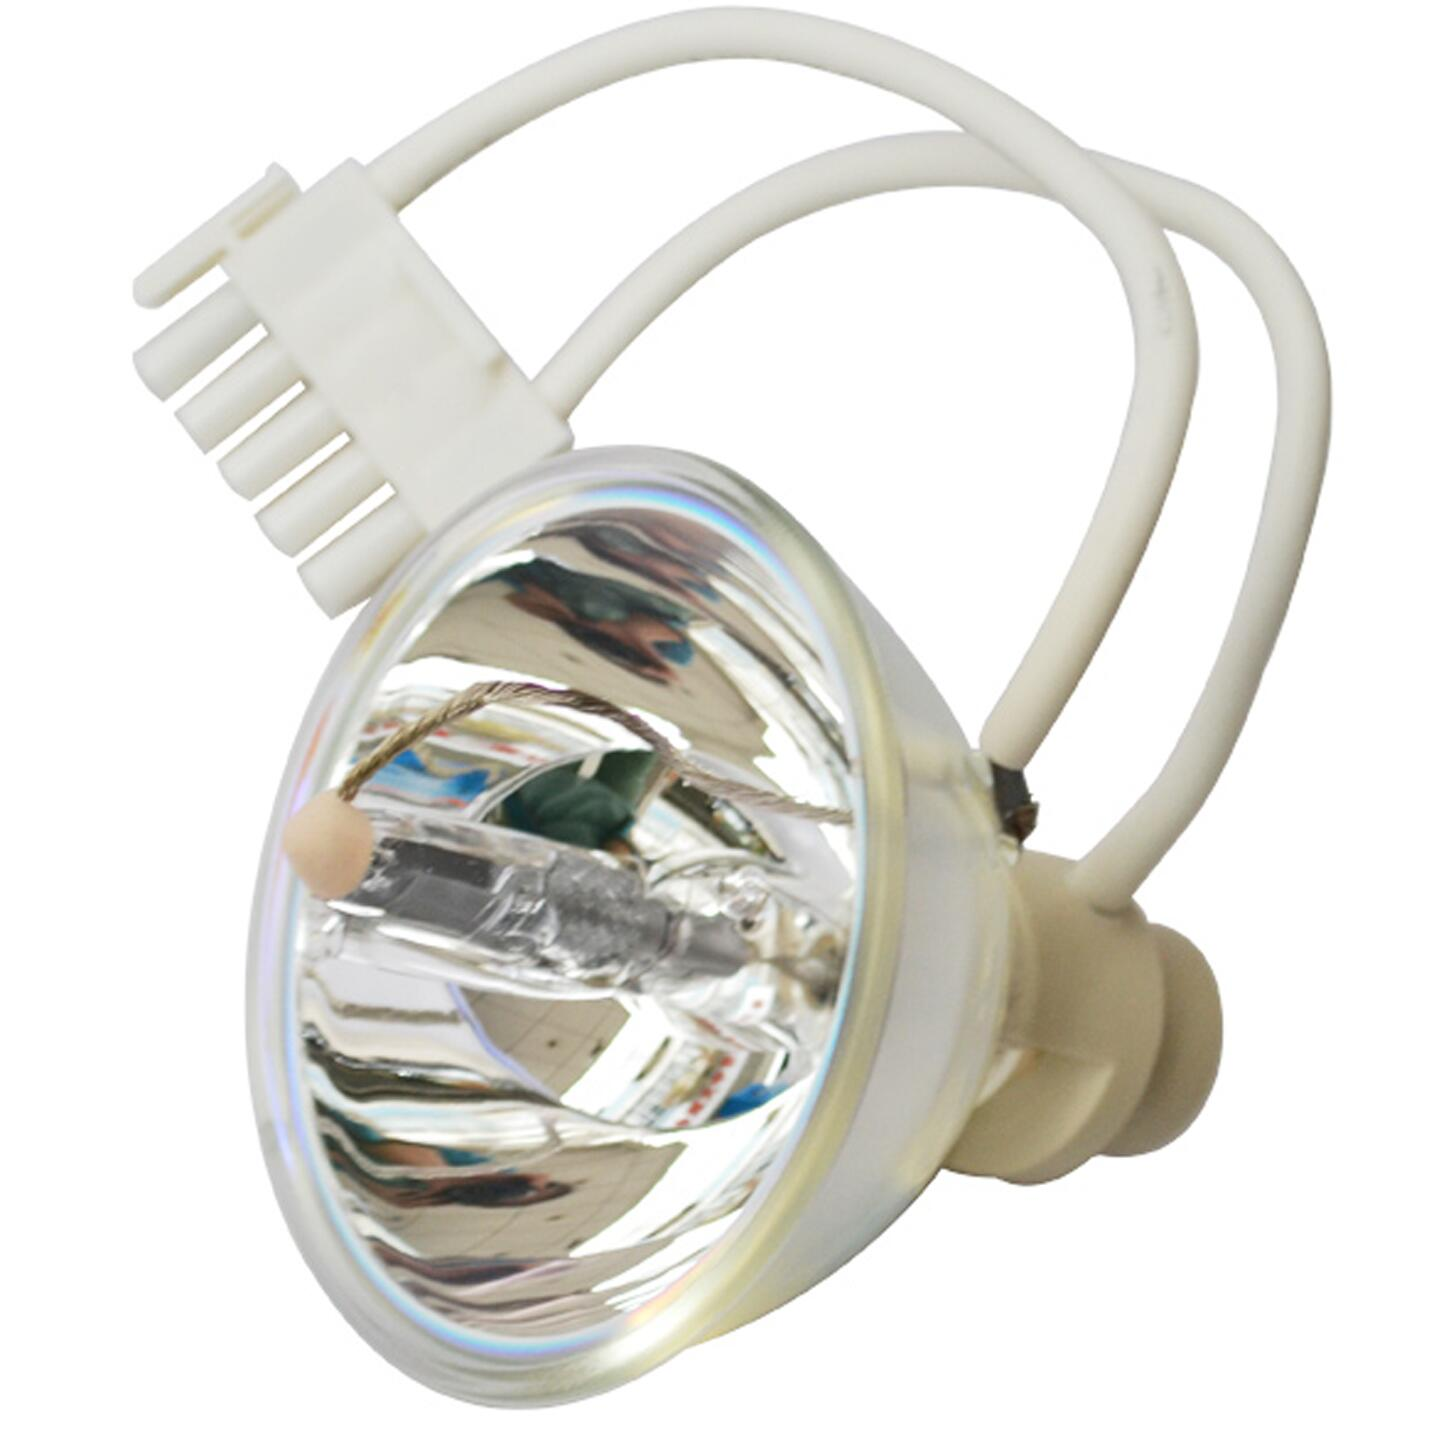 citroen bulbs beam image xenon low synergie set lamp headlight high